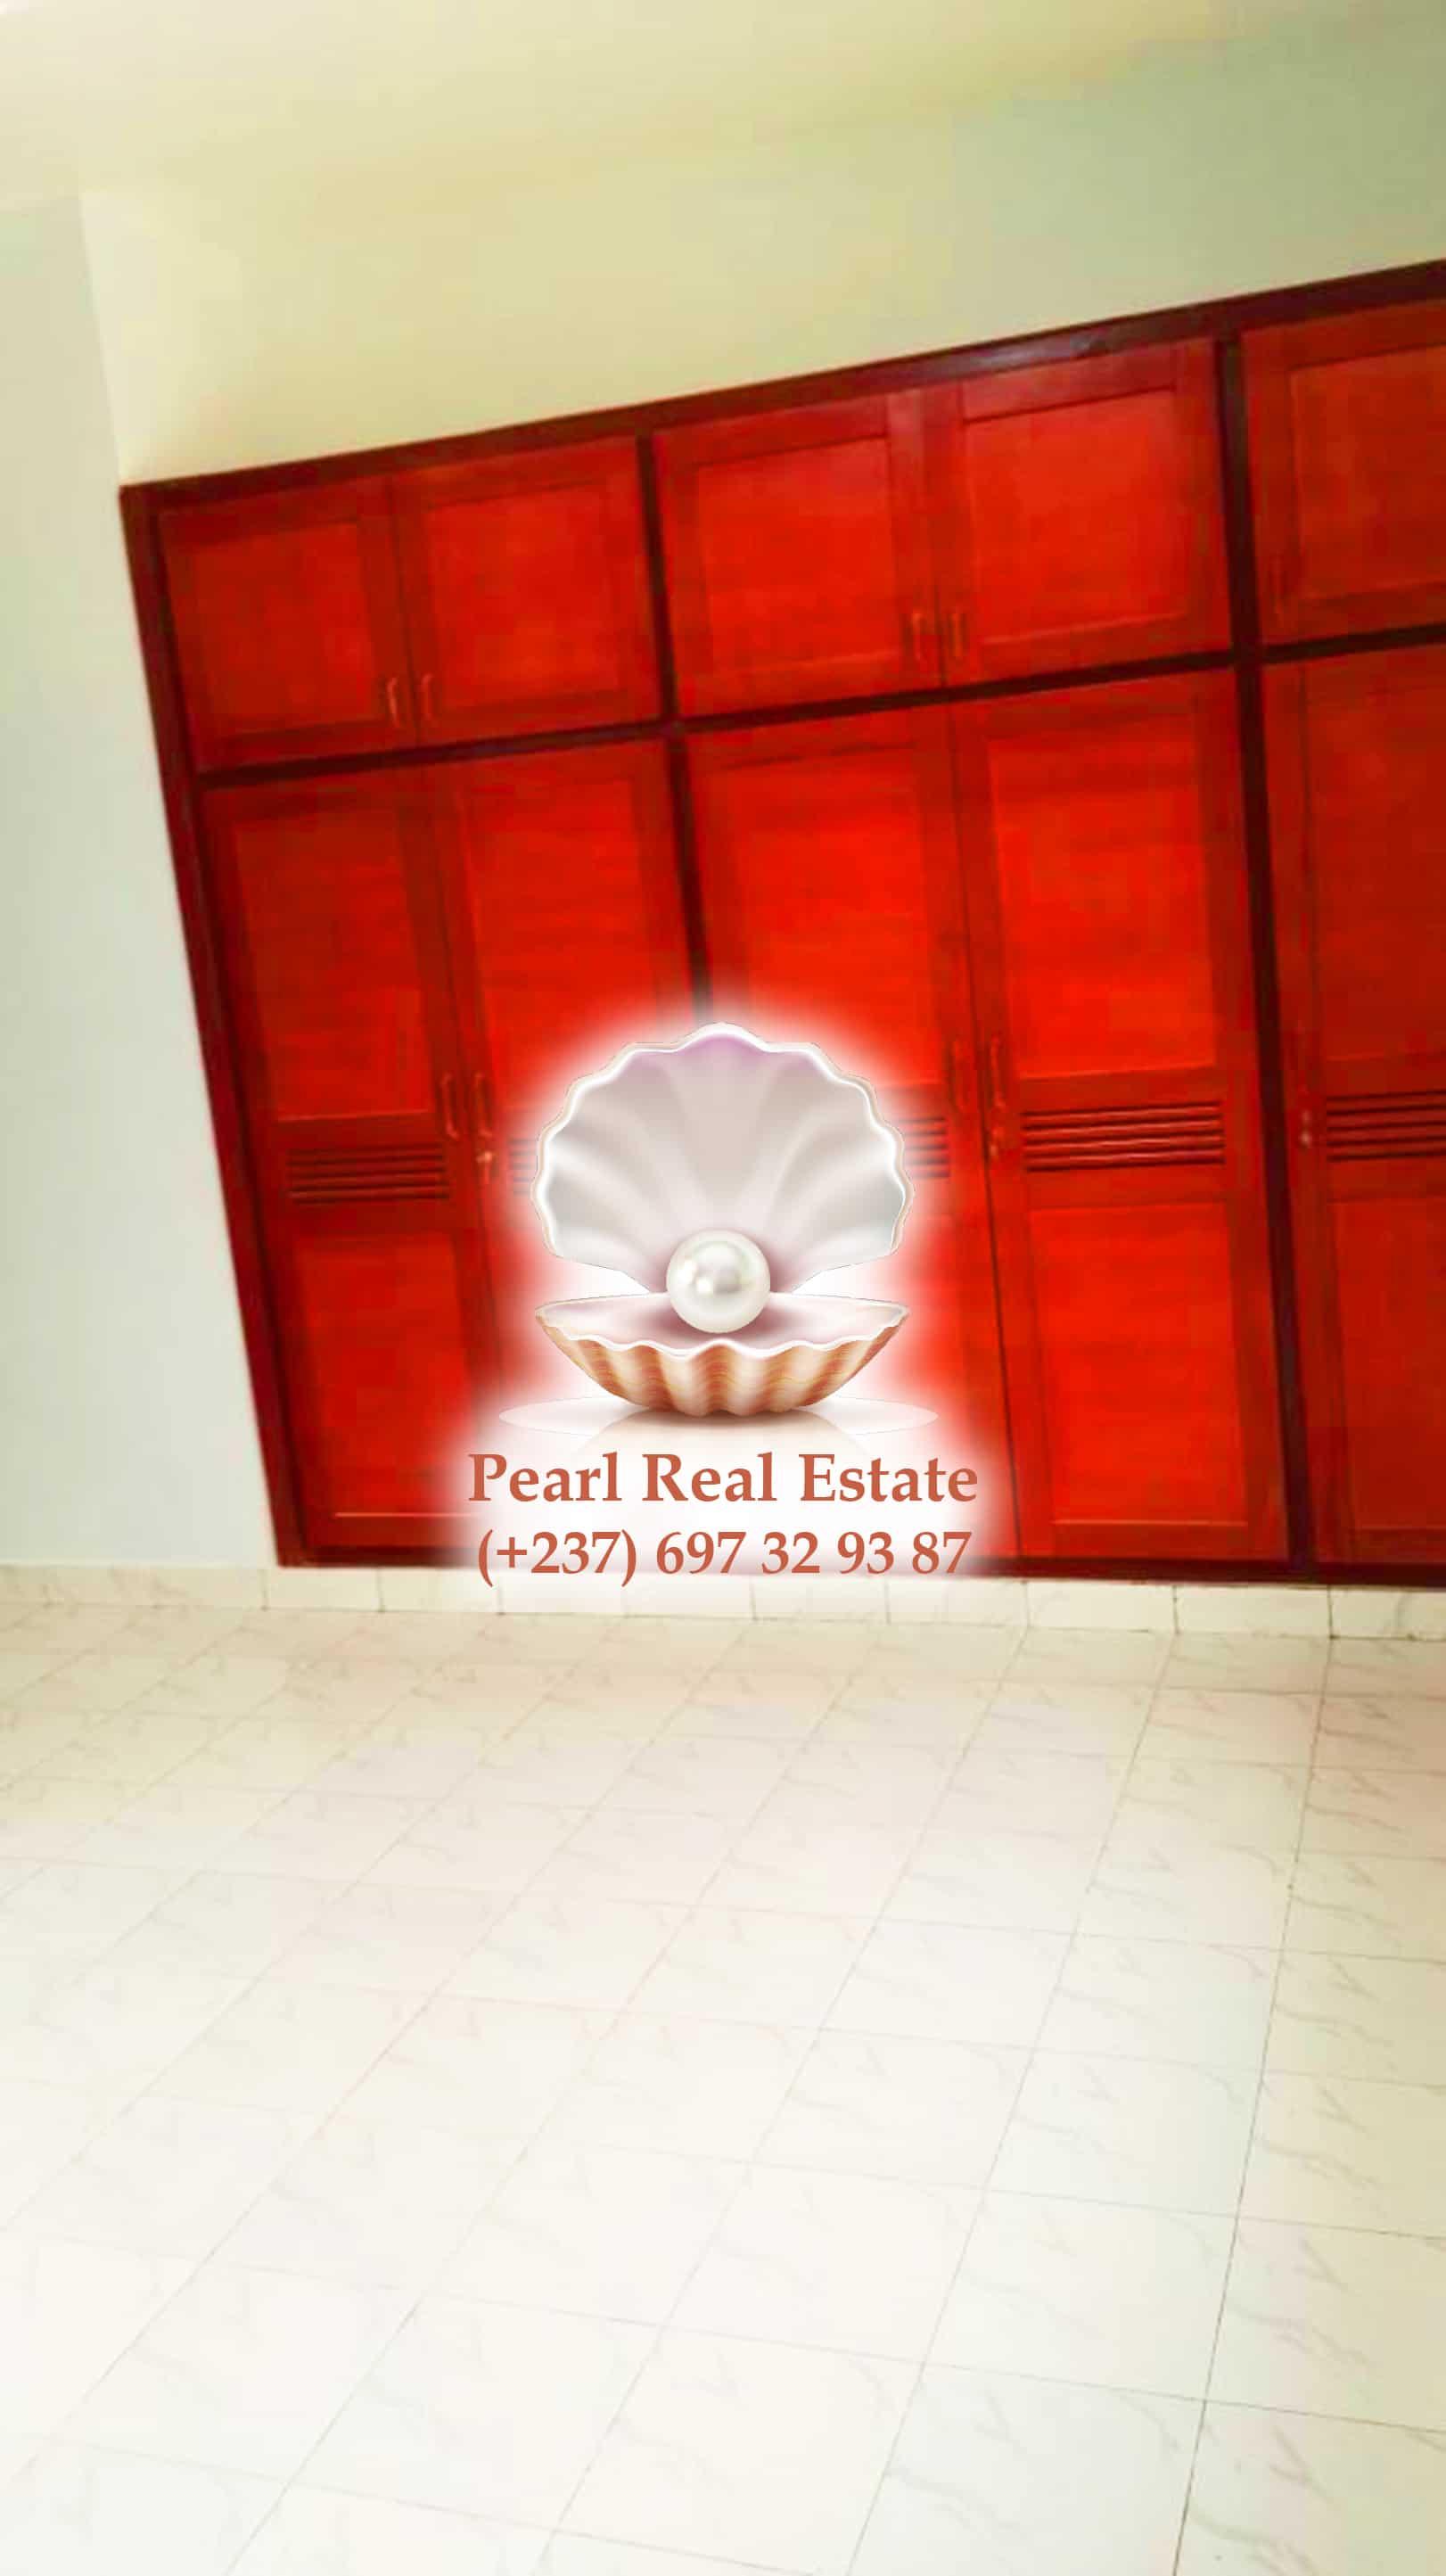 House (Villa) to rent - Yaoundé, Mfandena, Omnisports - 1 living room(s), 3 bedroom(s), 3 bathroom(s) - 450 000 FCFA / month